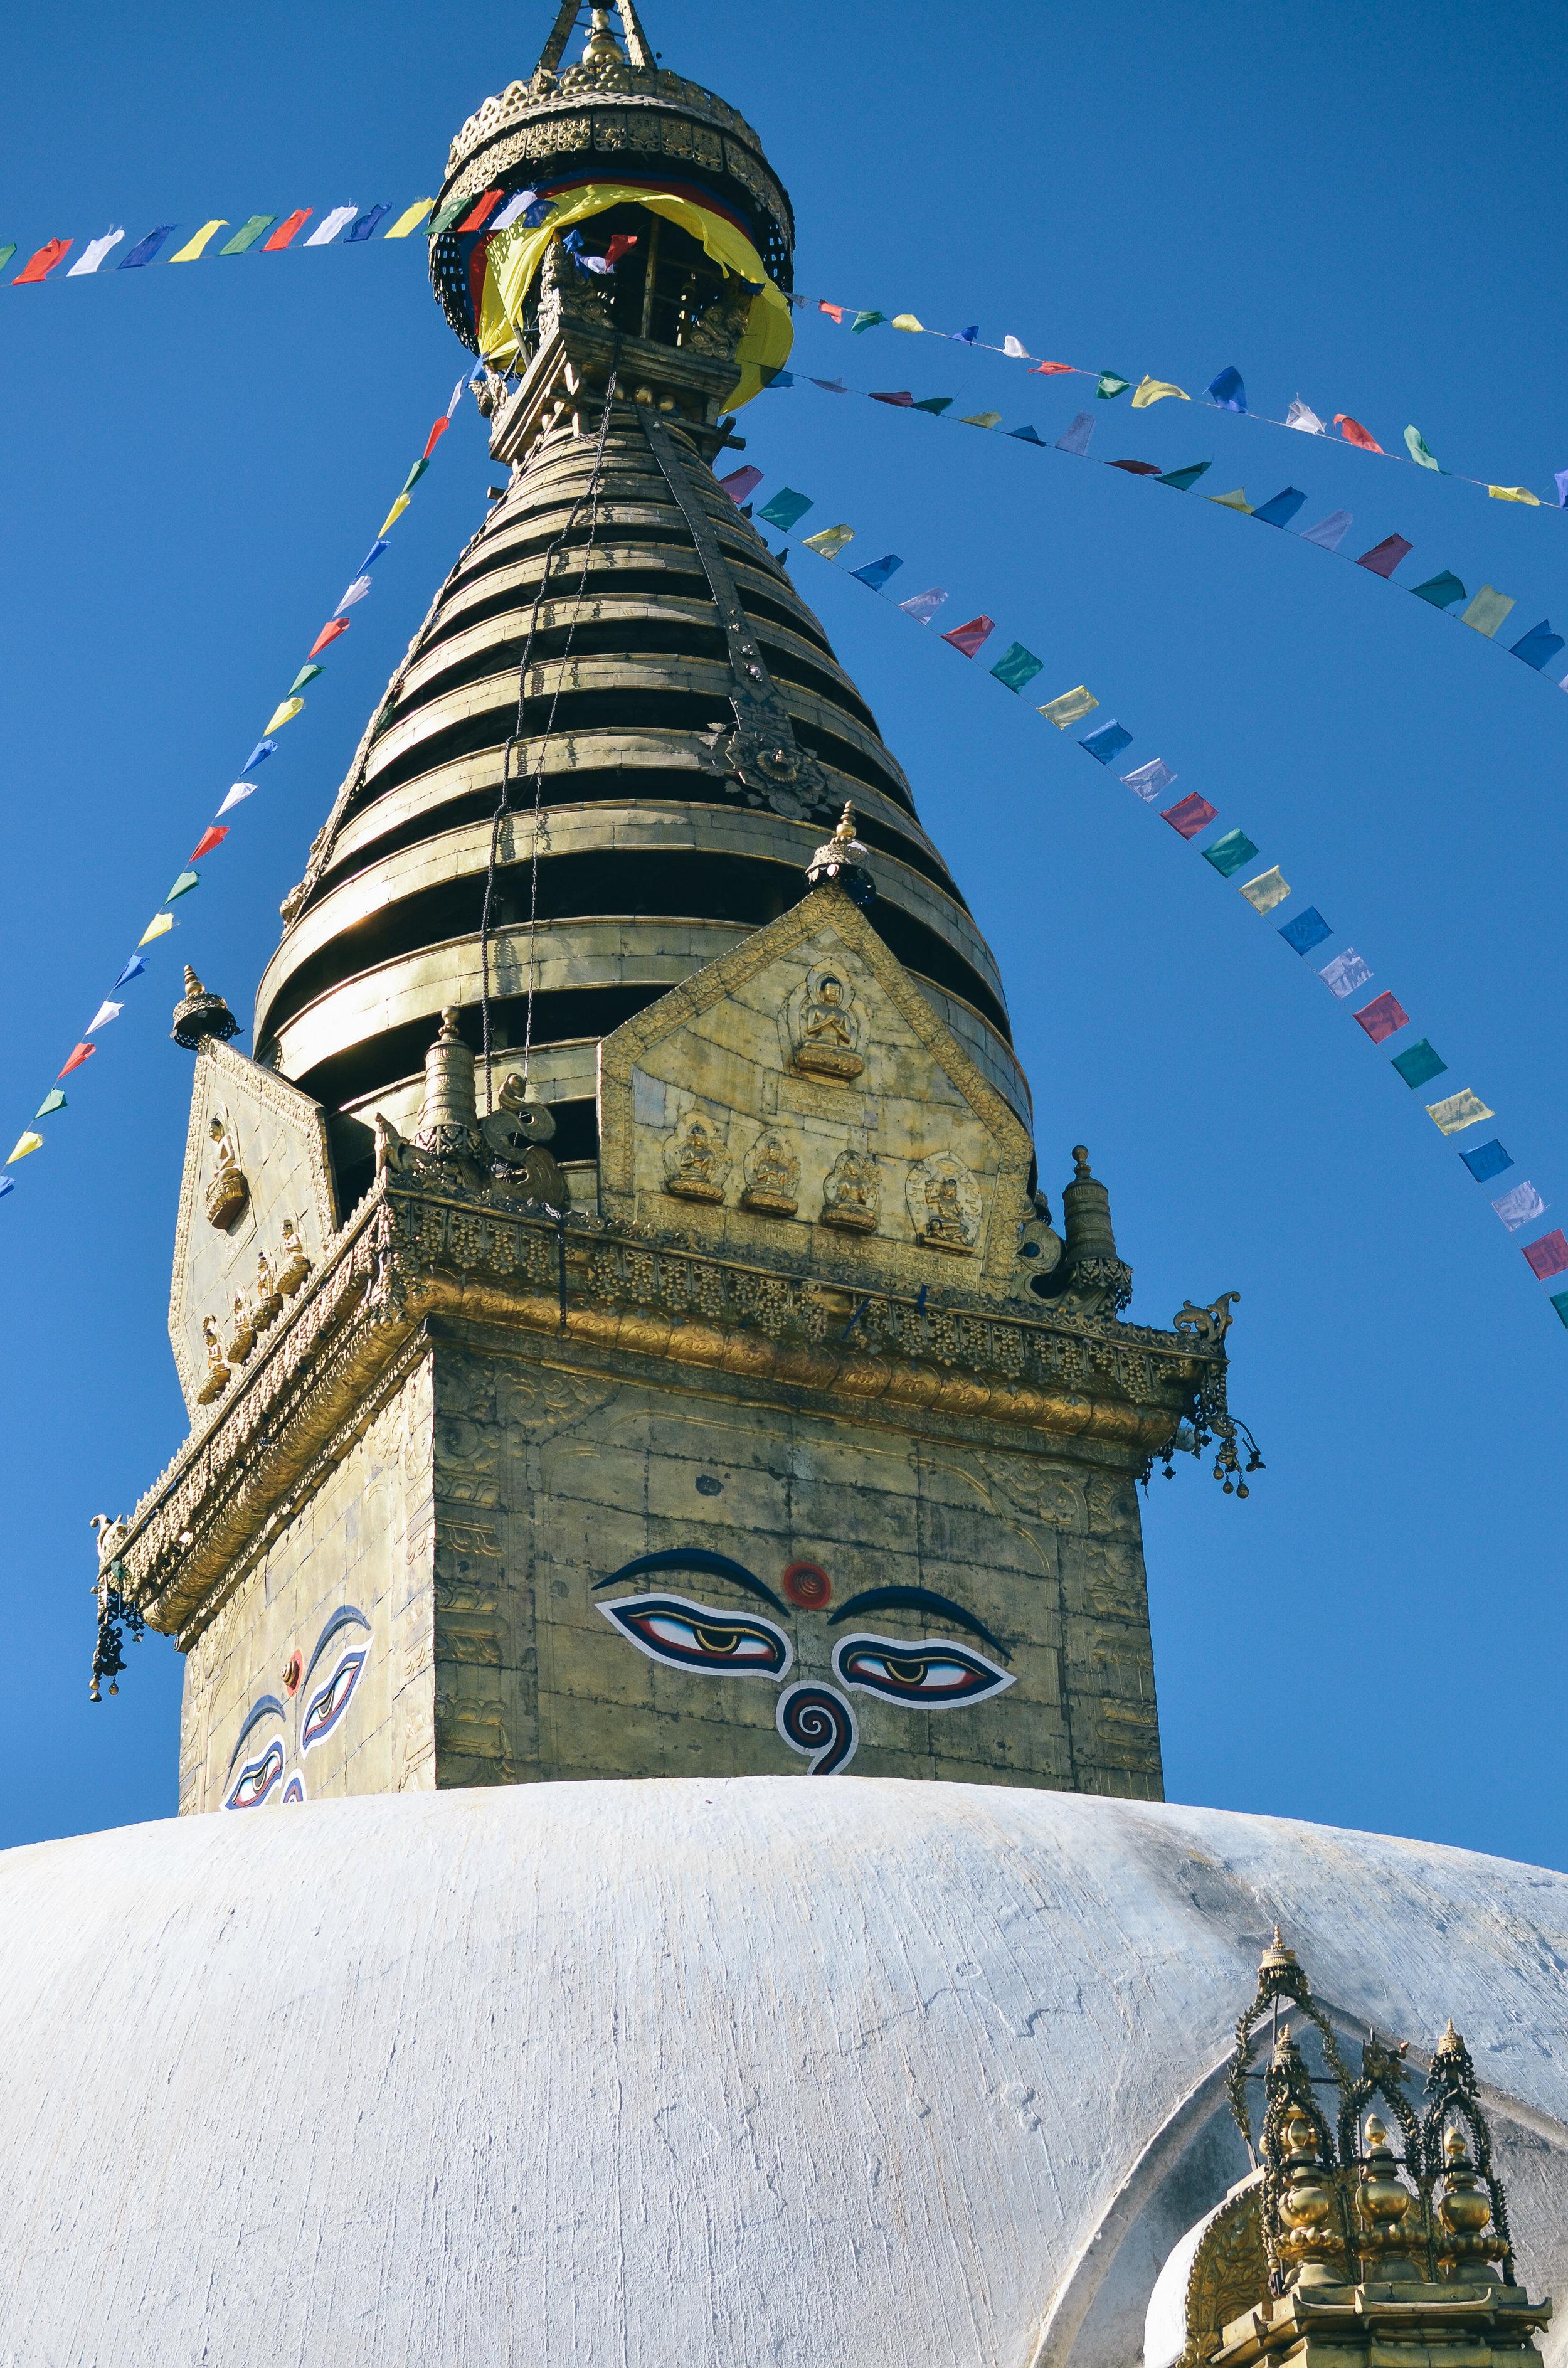 10-things-to-know-kathmandu-nepal-lifeonpine_DSC_1724.jpg